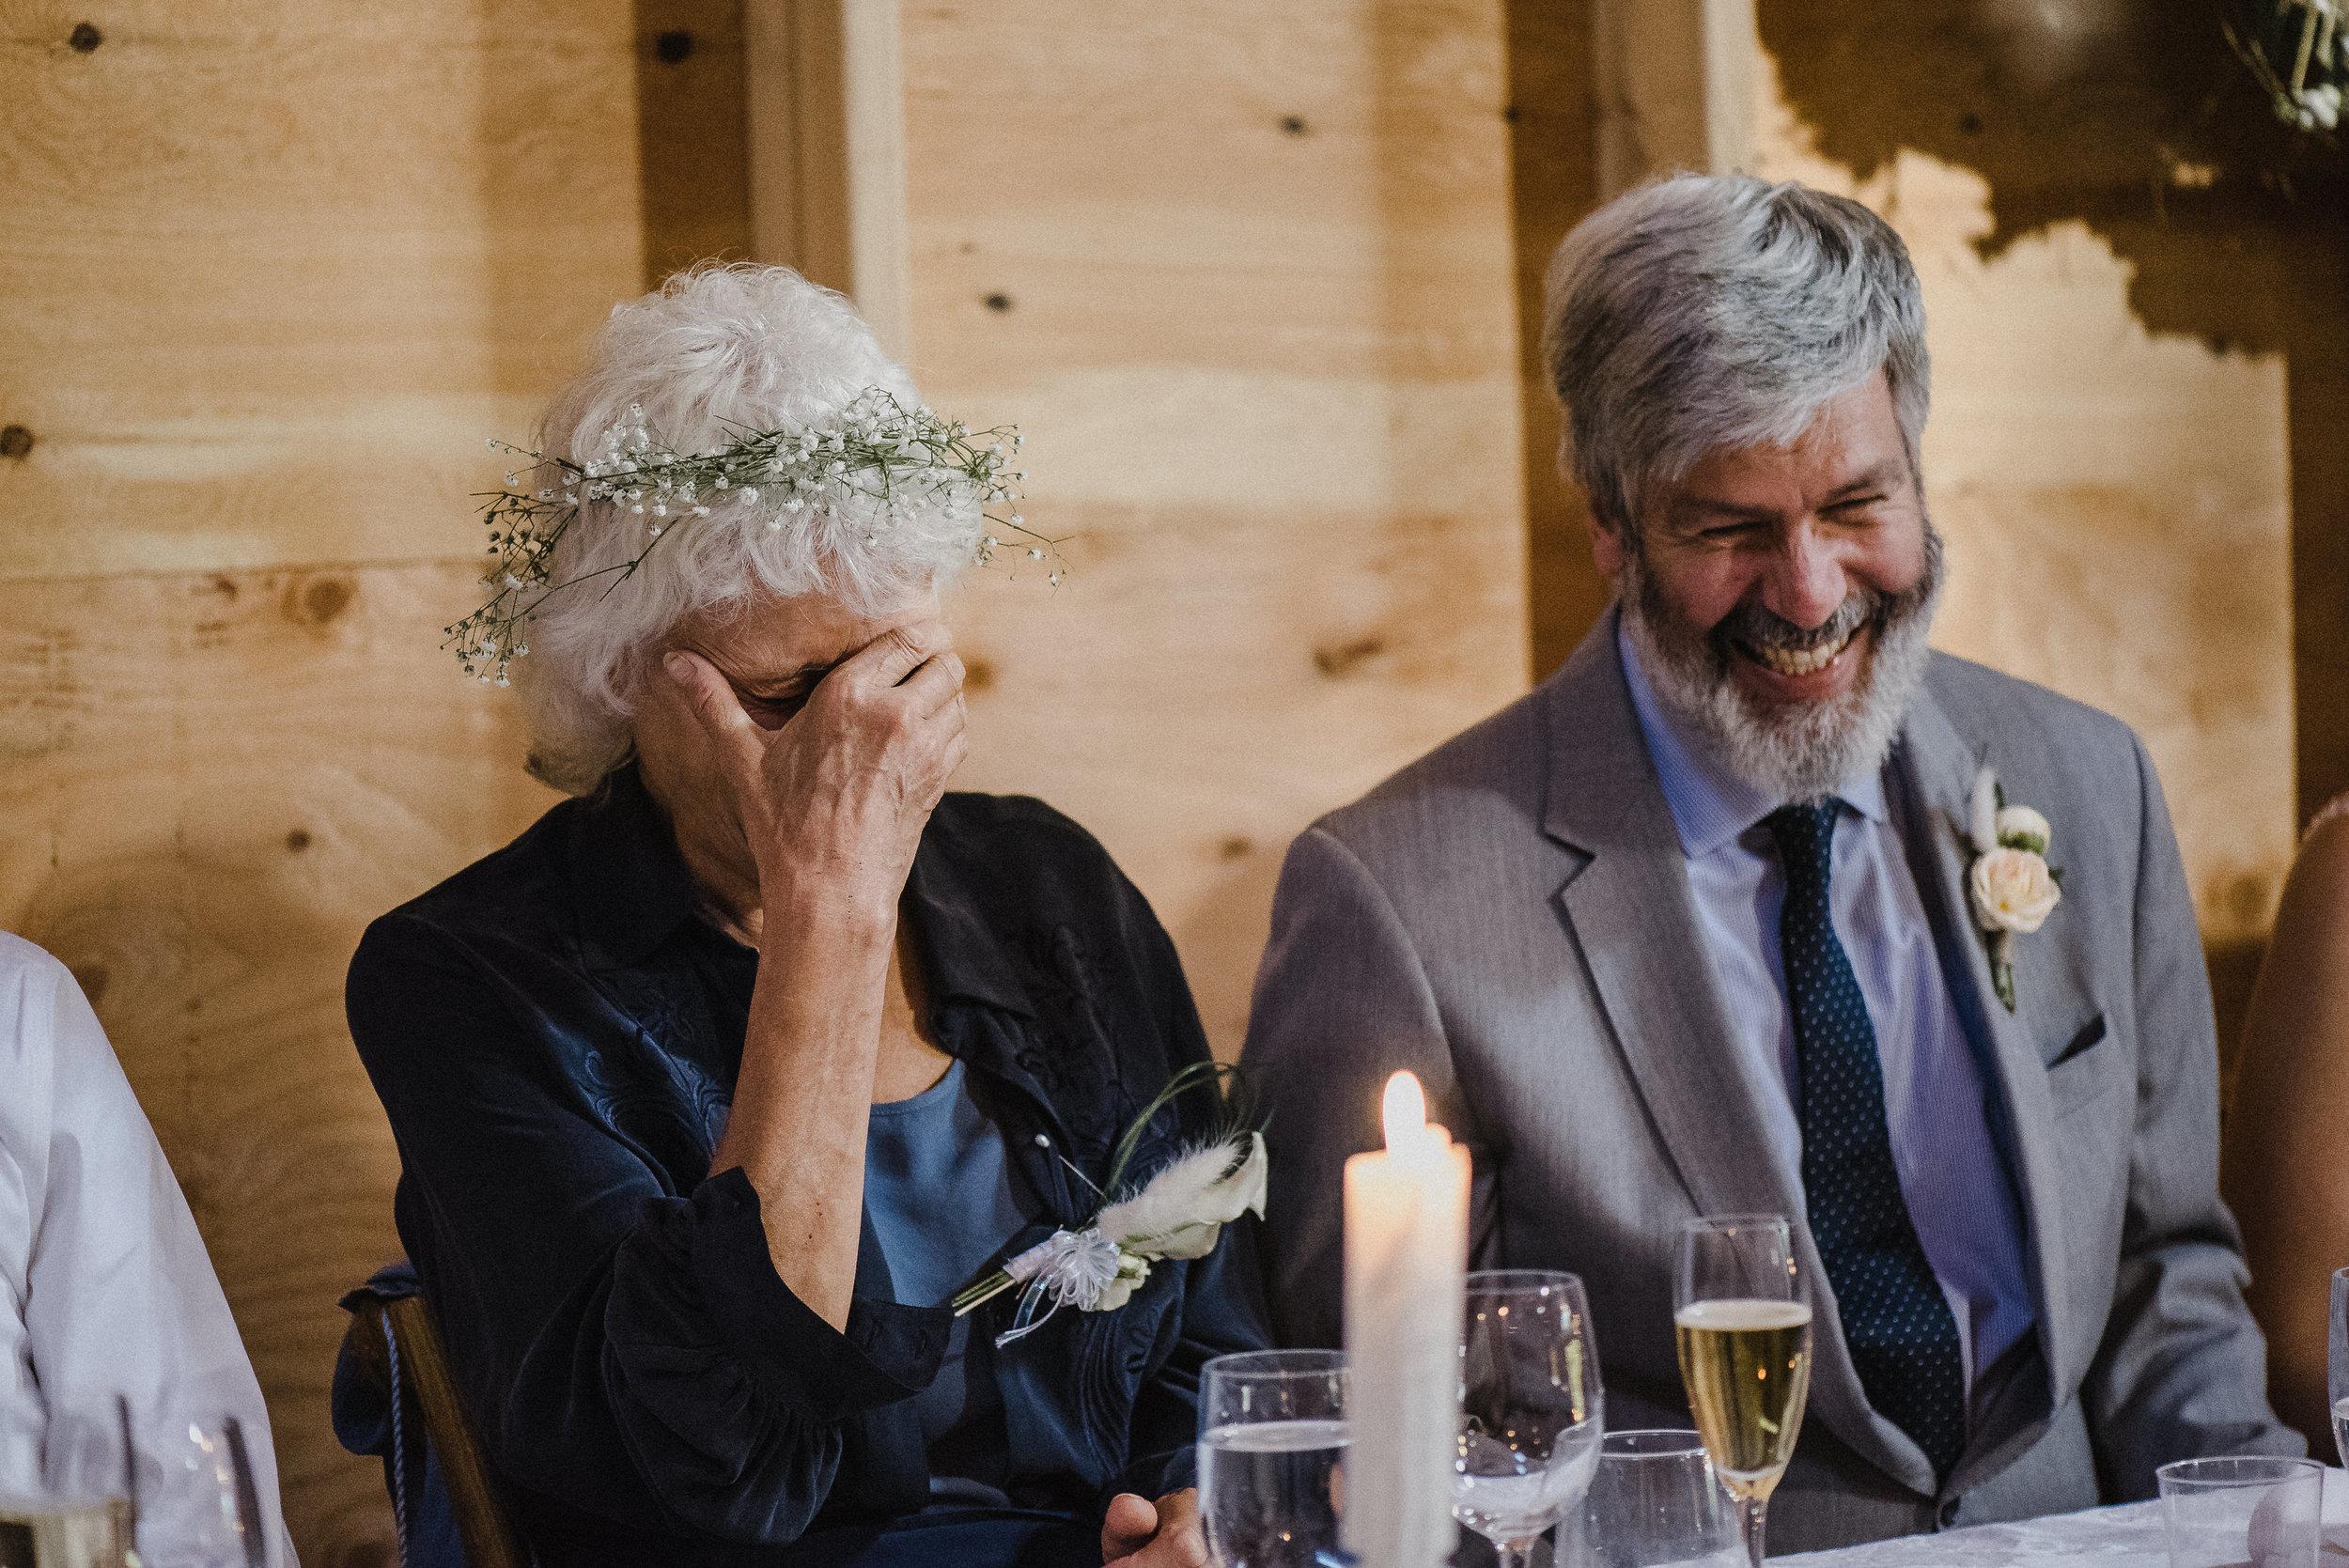 Fun times at Summer Star Ranch wedding reception